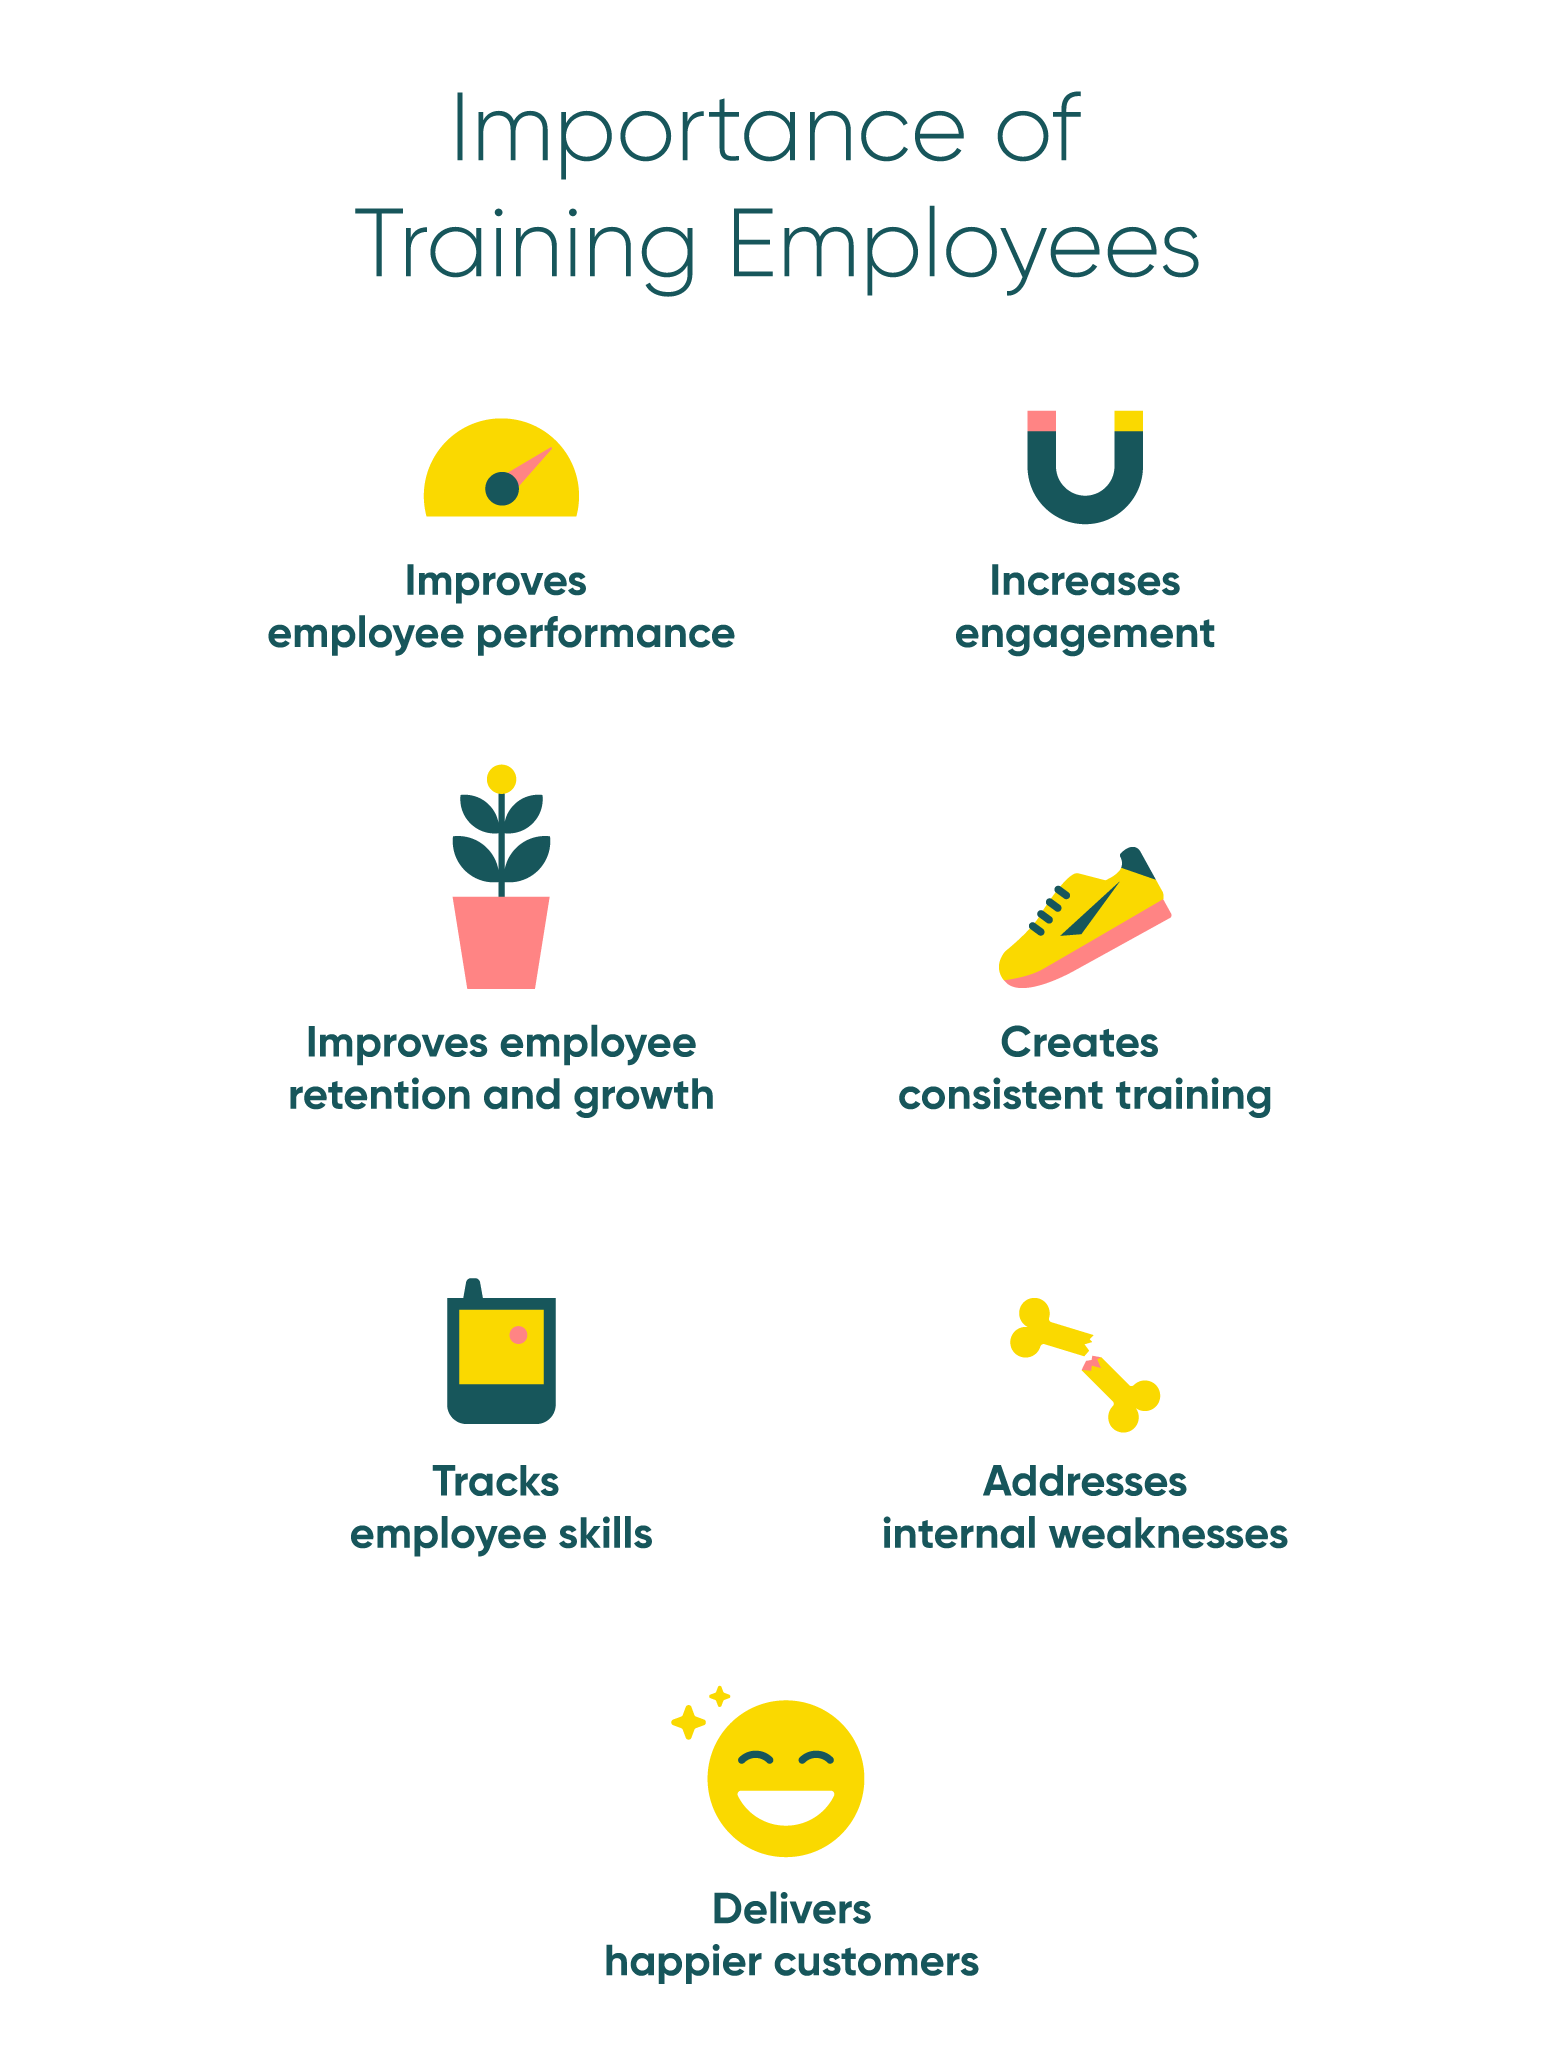 Importance of training employees